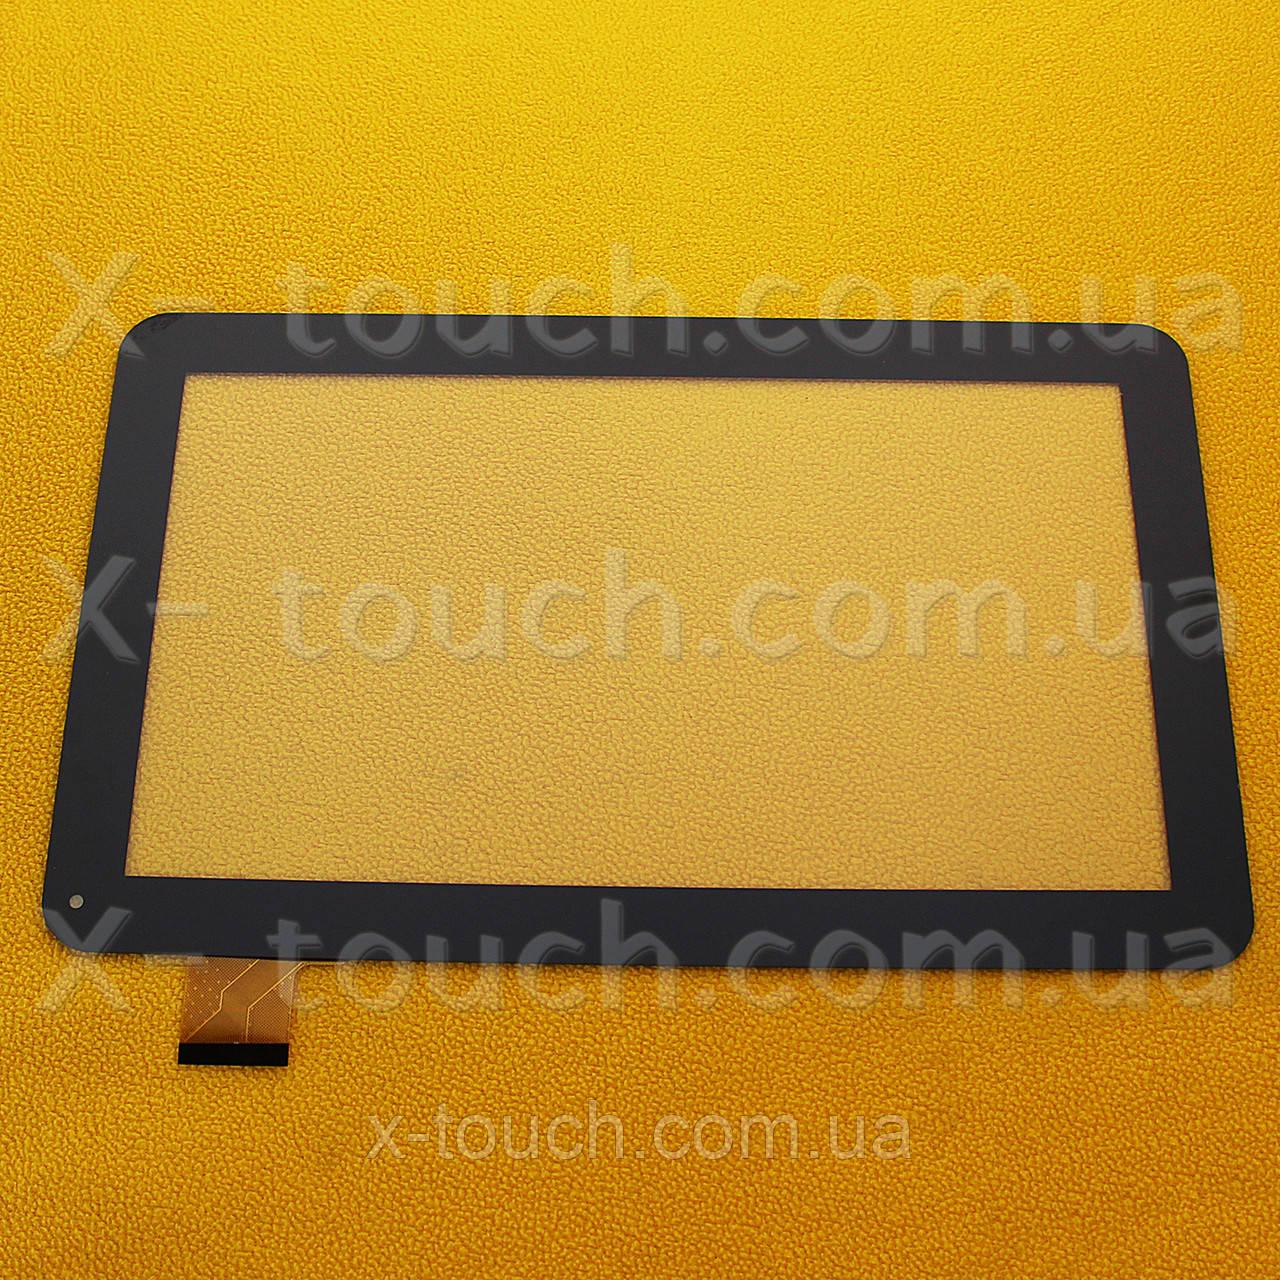 Тачскрин, сенсор  XC-PG1010-019-A0 XLY  для планшета